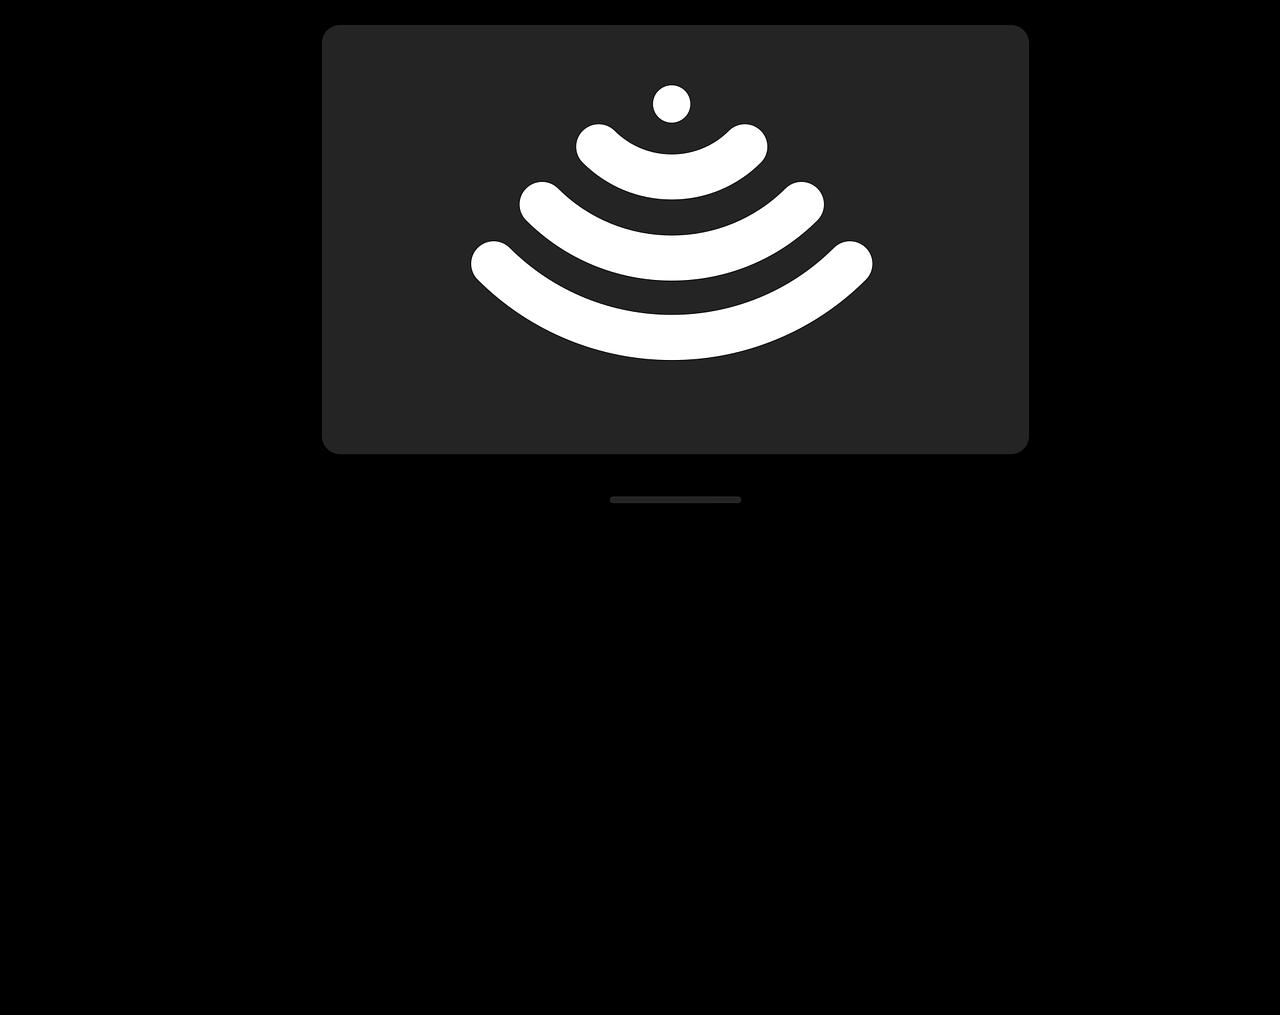 ultrasound-5361309_1280